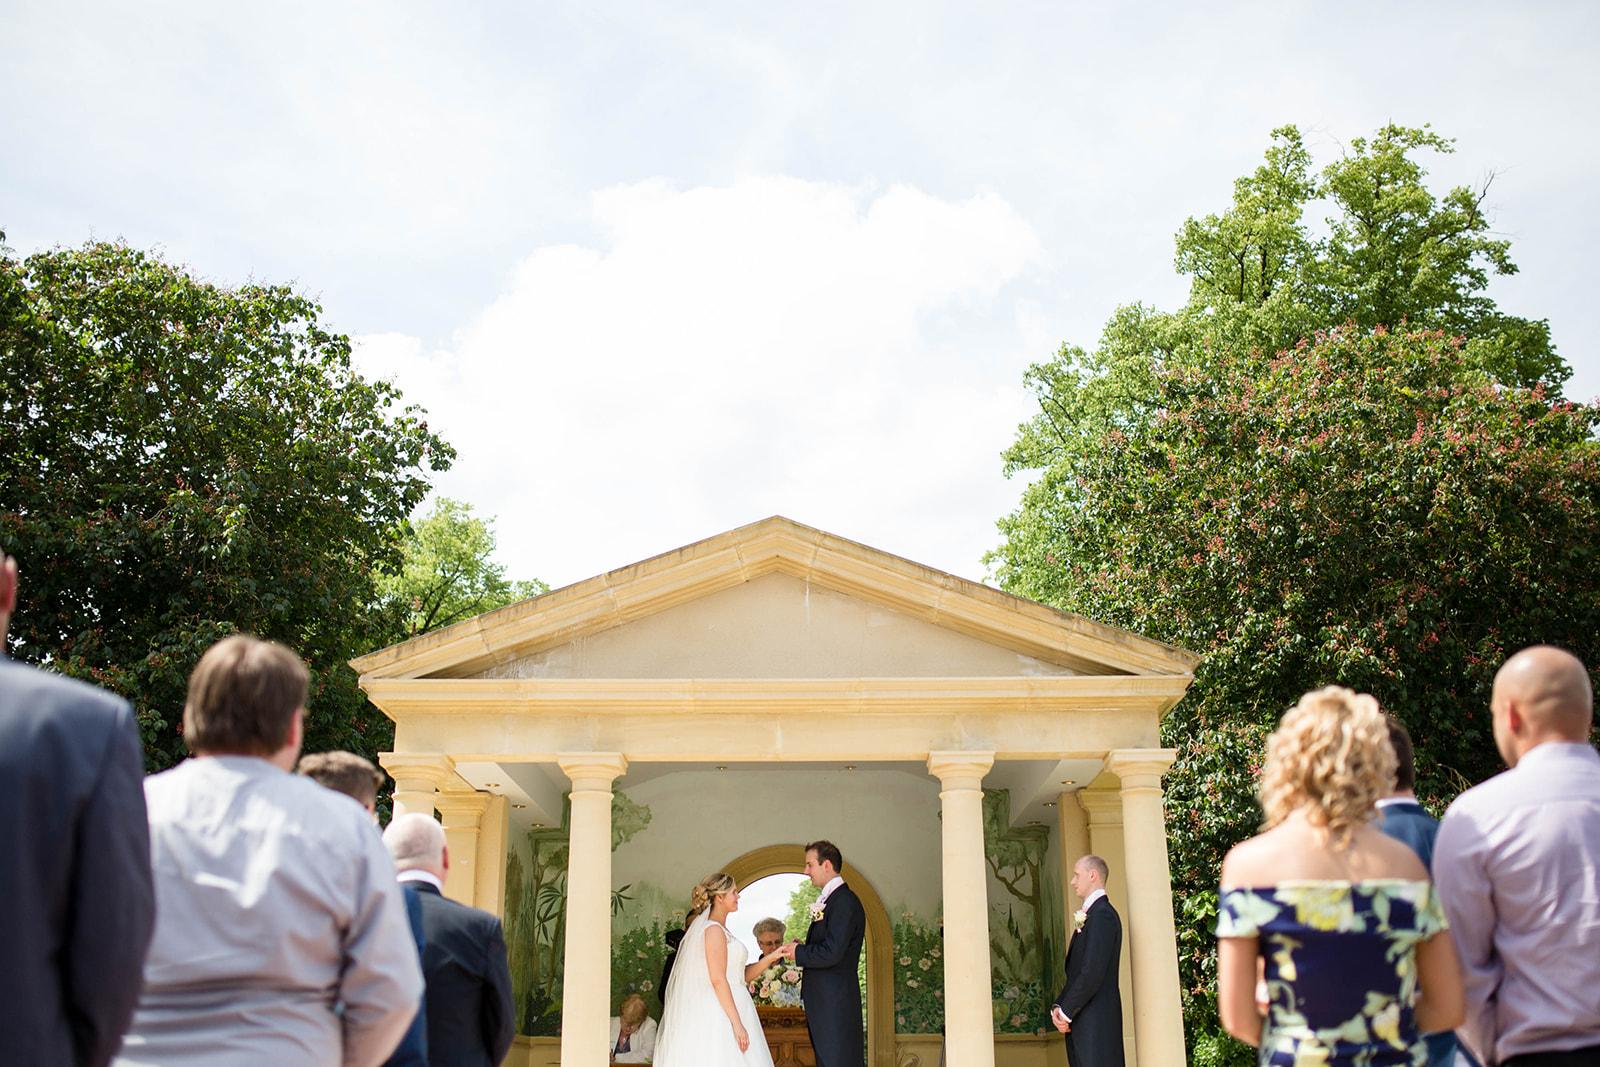 Rowton castle wedding photography Shrewsbury wedding photographer